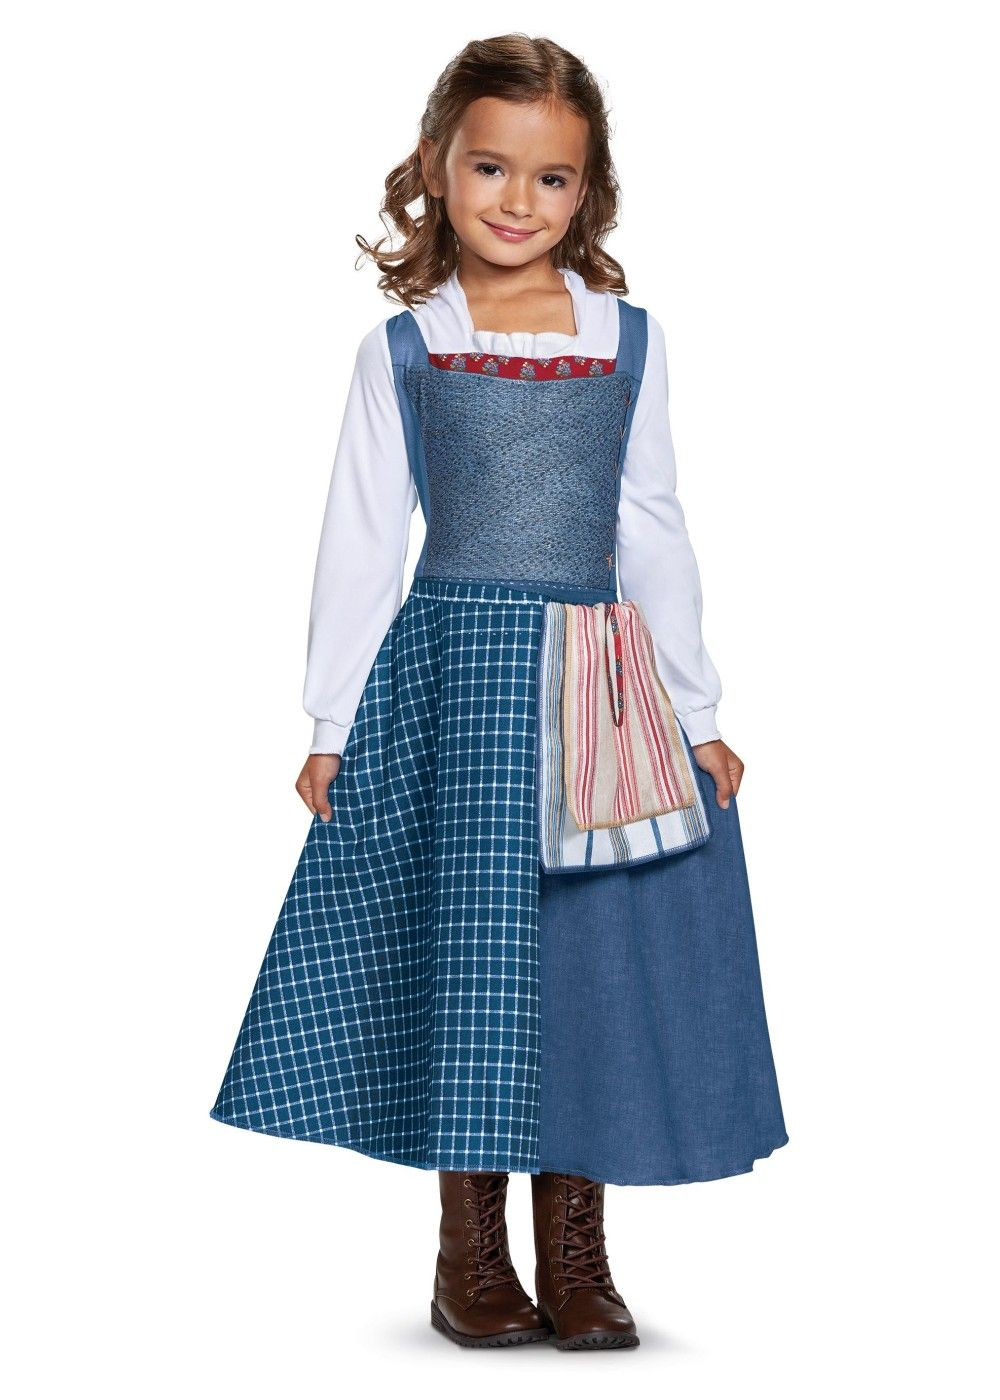 Village Belle Girls Costume